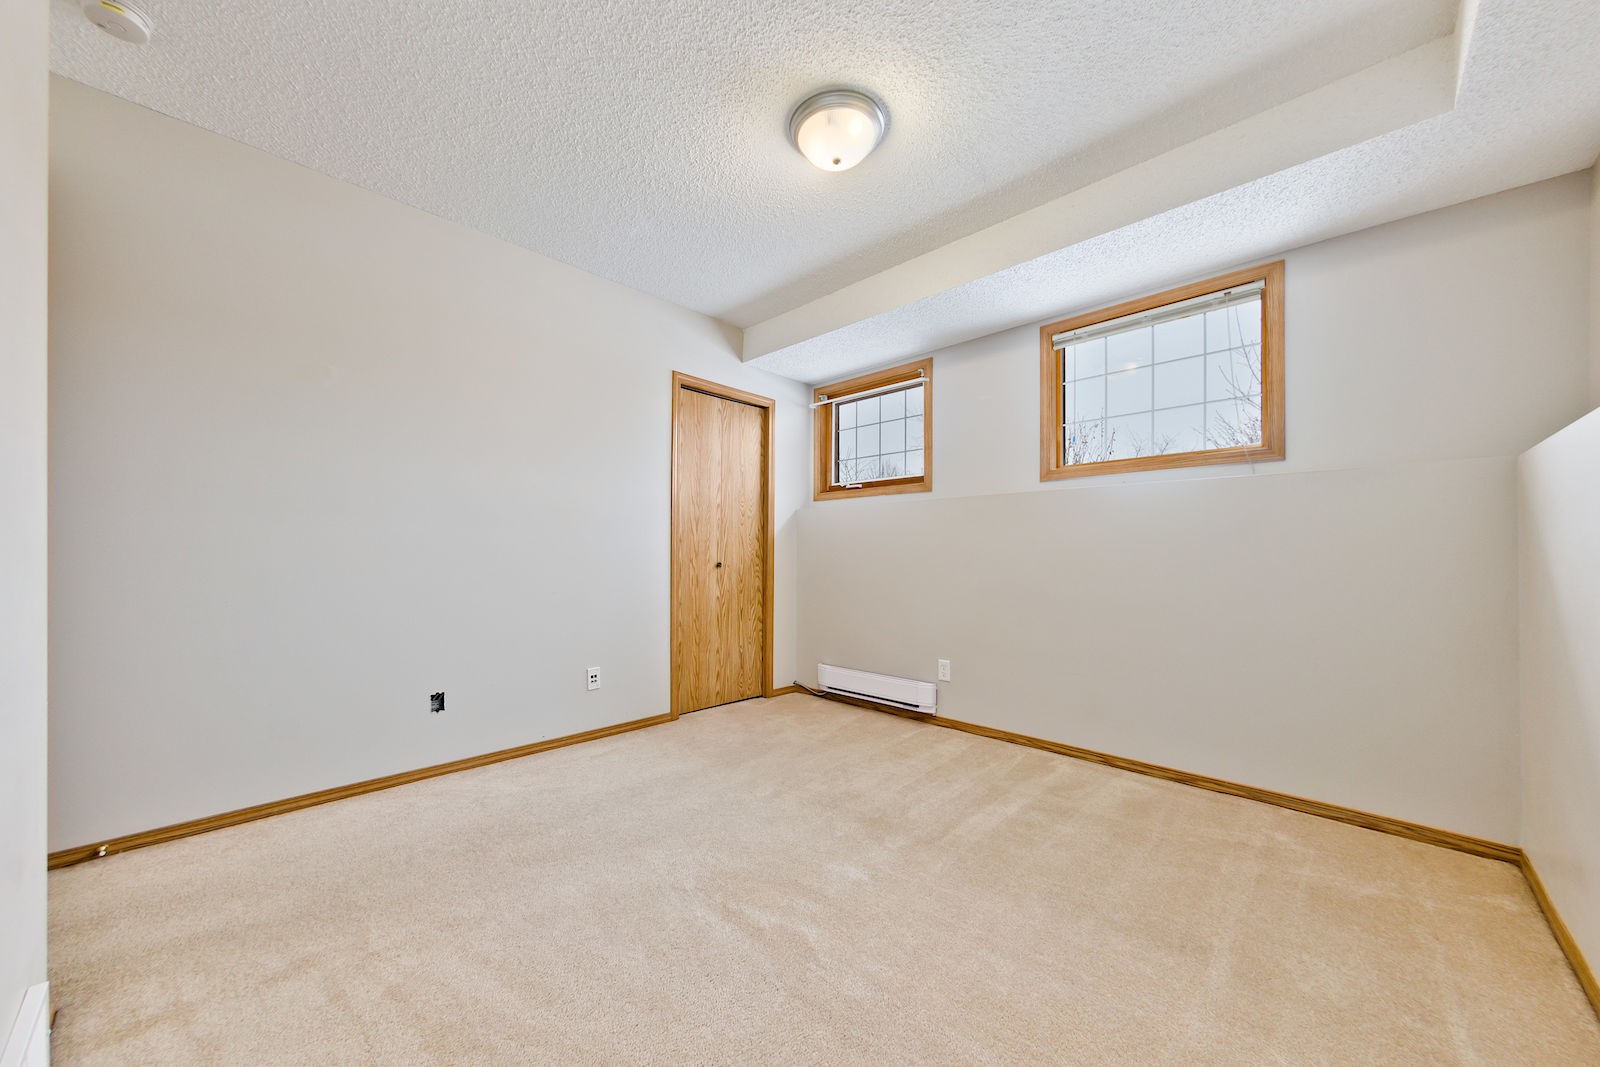 Calgary Pet Friendly Basement For Rent Evergreen 50 Off Dec Wiring Bedroom